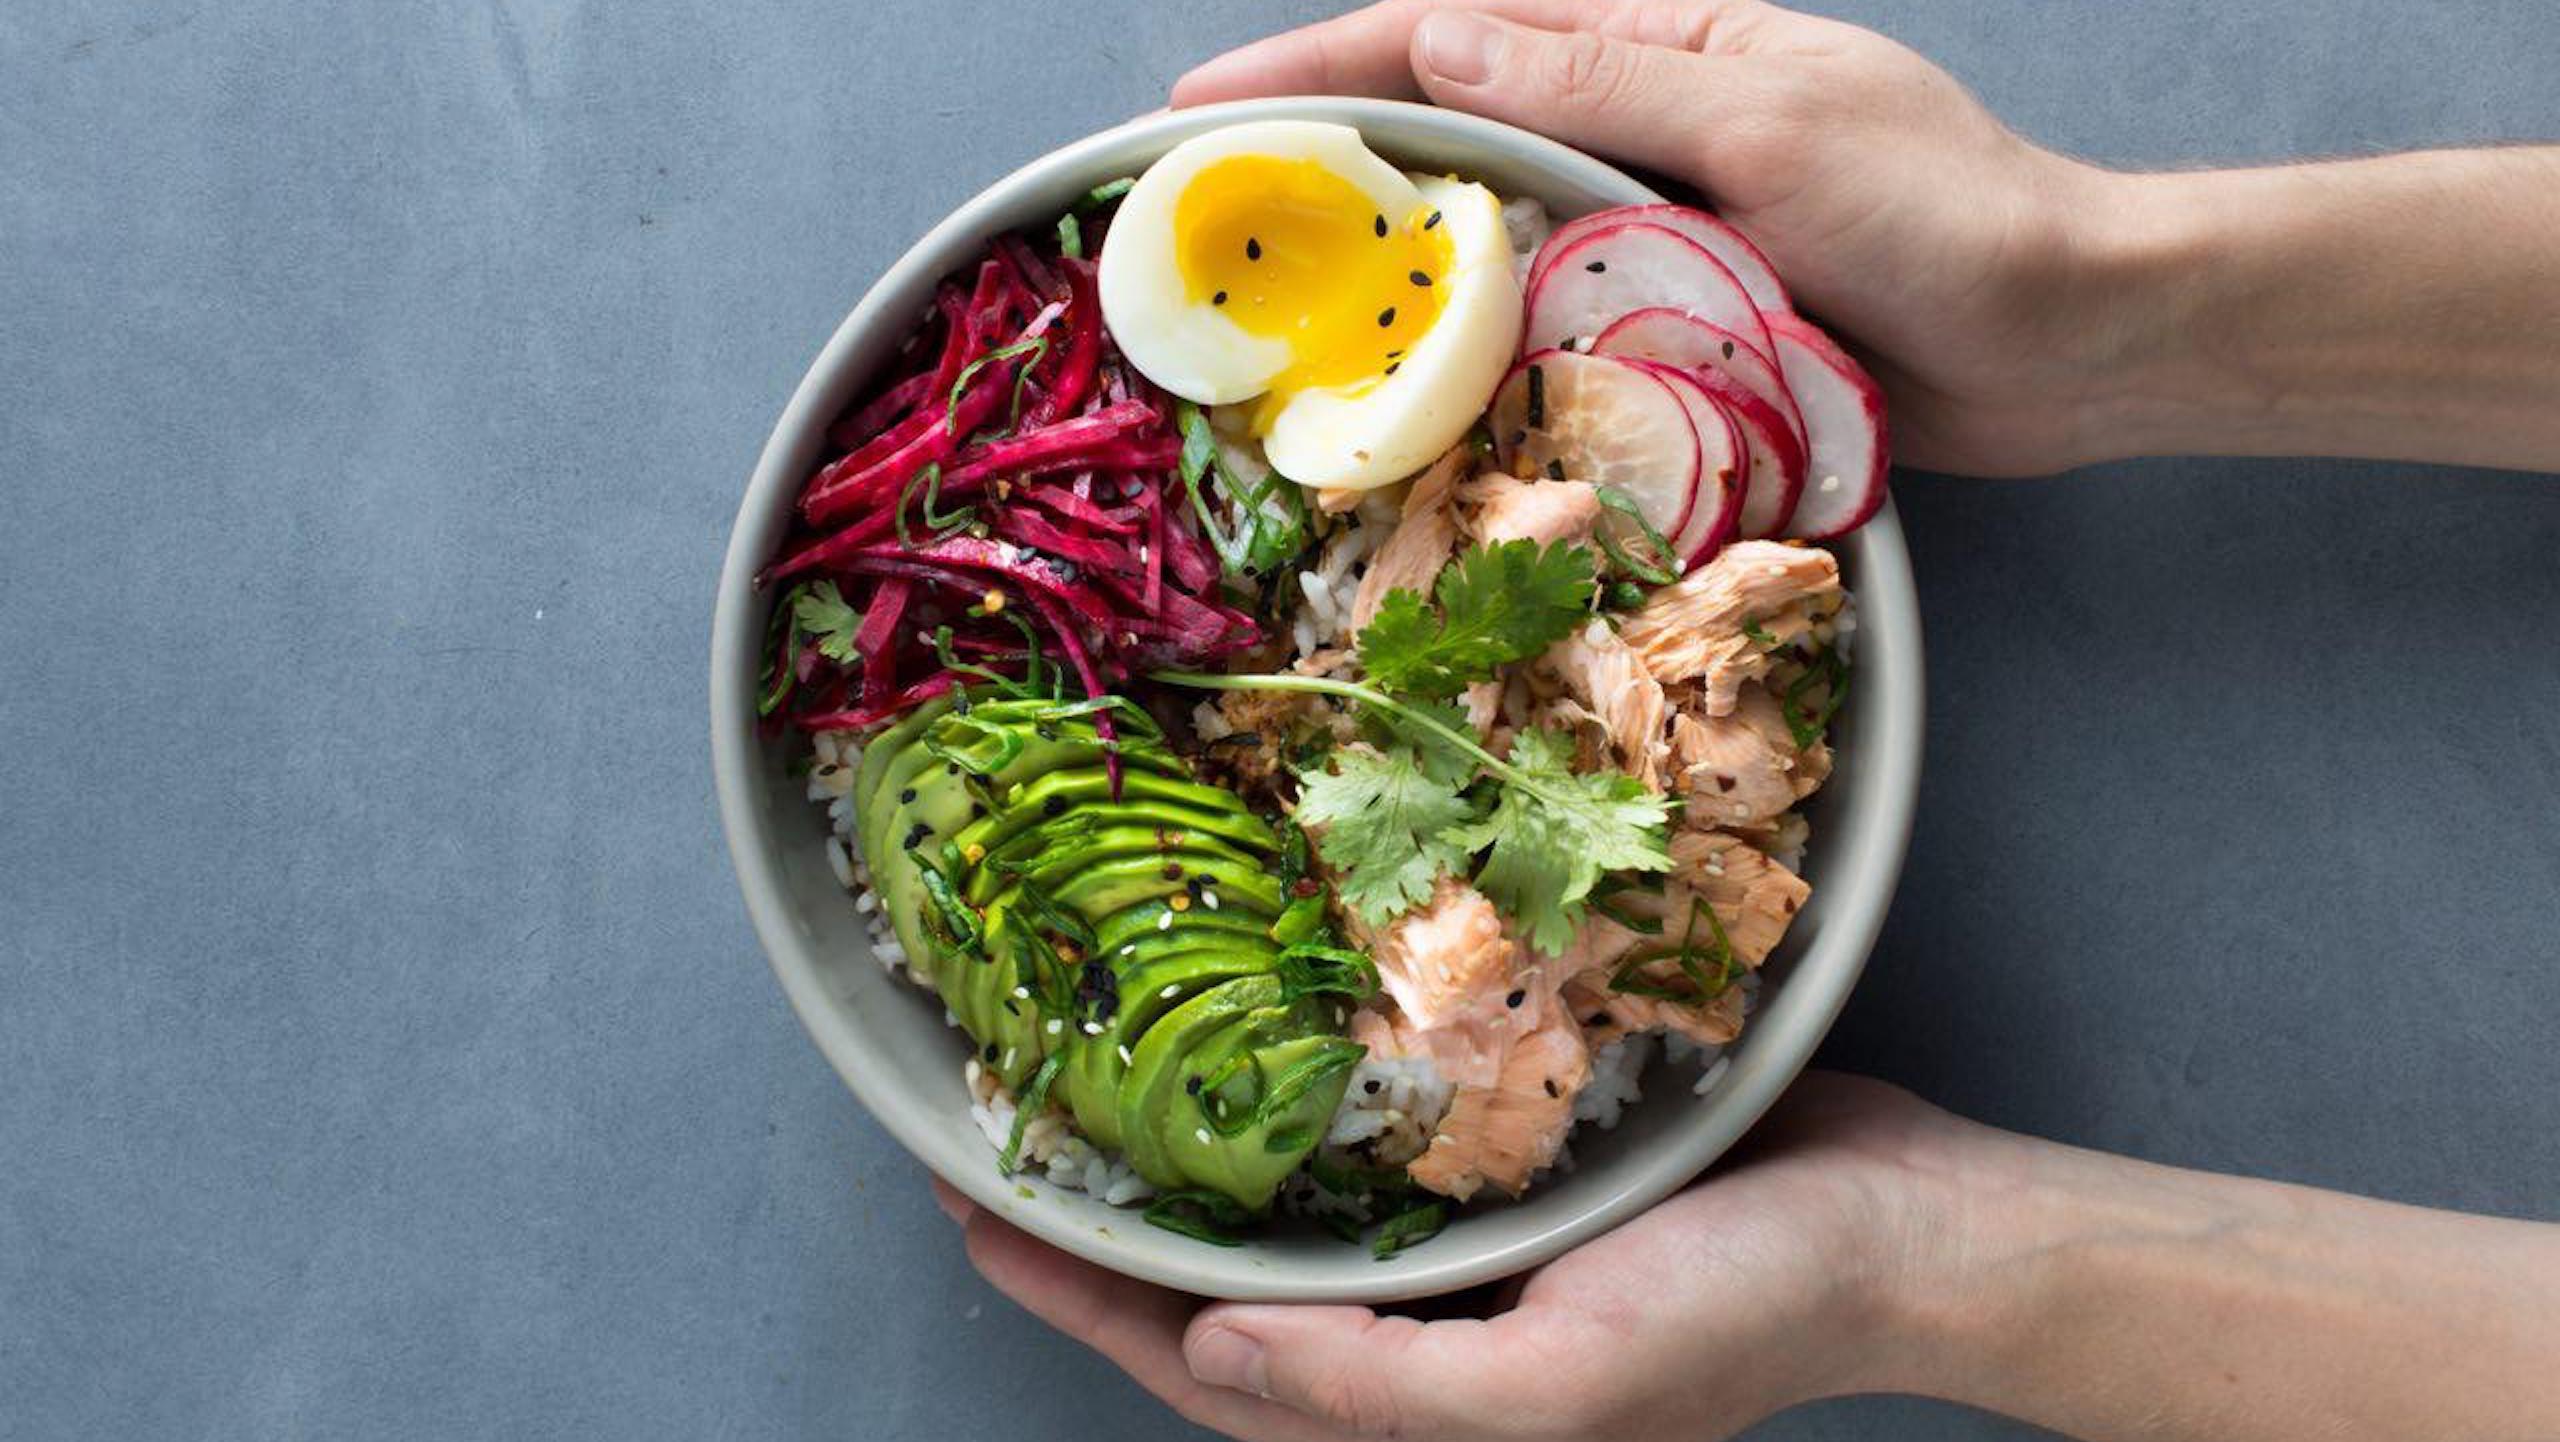 comida saludable, comida sana, condesa